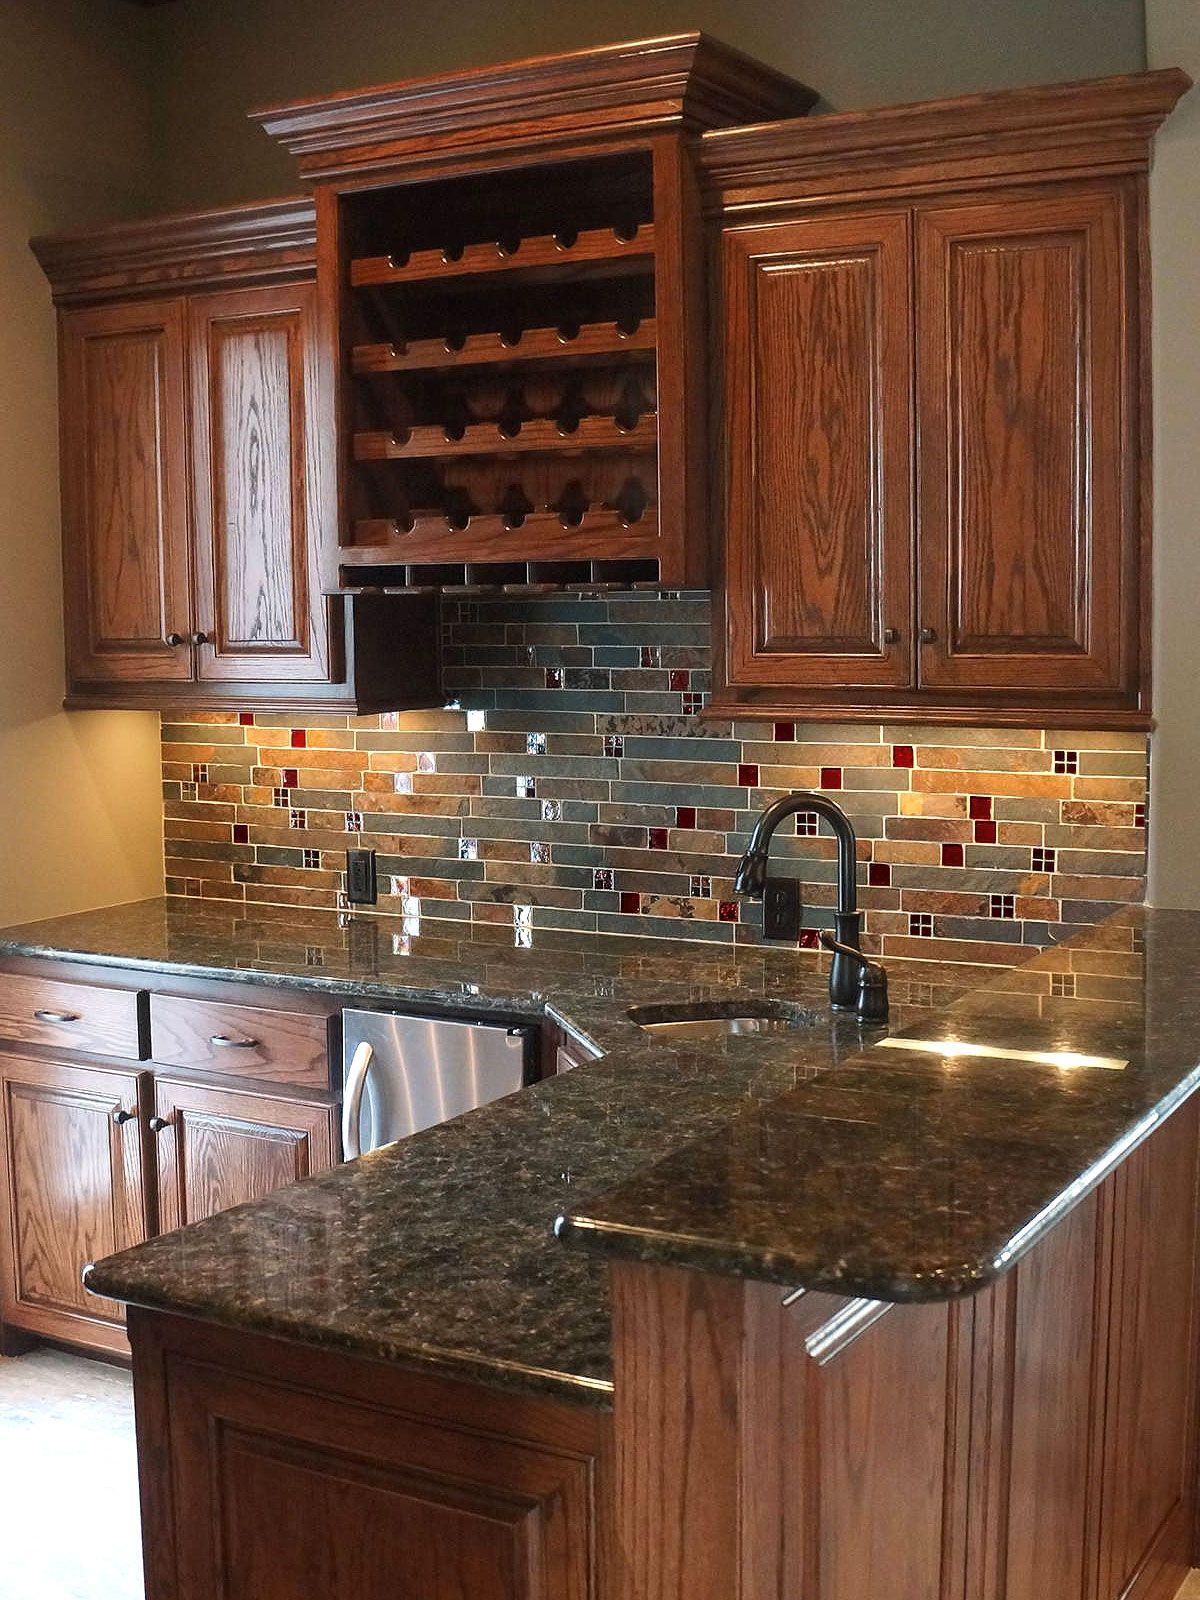 Stunning Slate Glass Kitchen Backsplash Slate Fire Kitchen Countertops Granite Colors Rustic Kitchen Backsplash Backsplash With Dark Cabinets